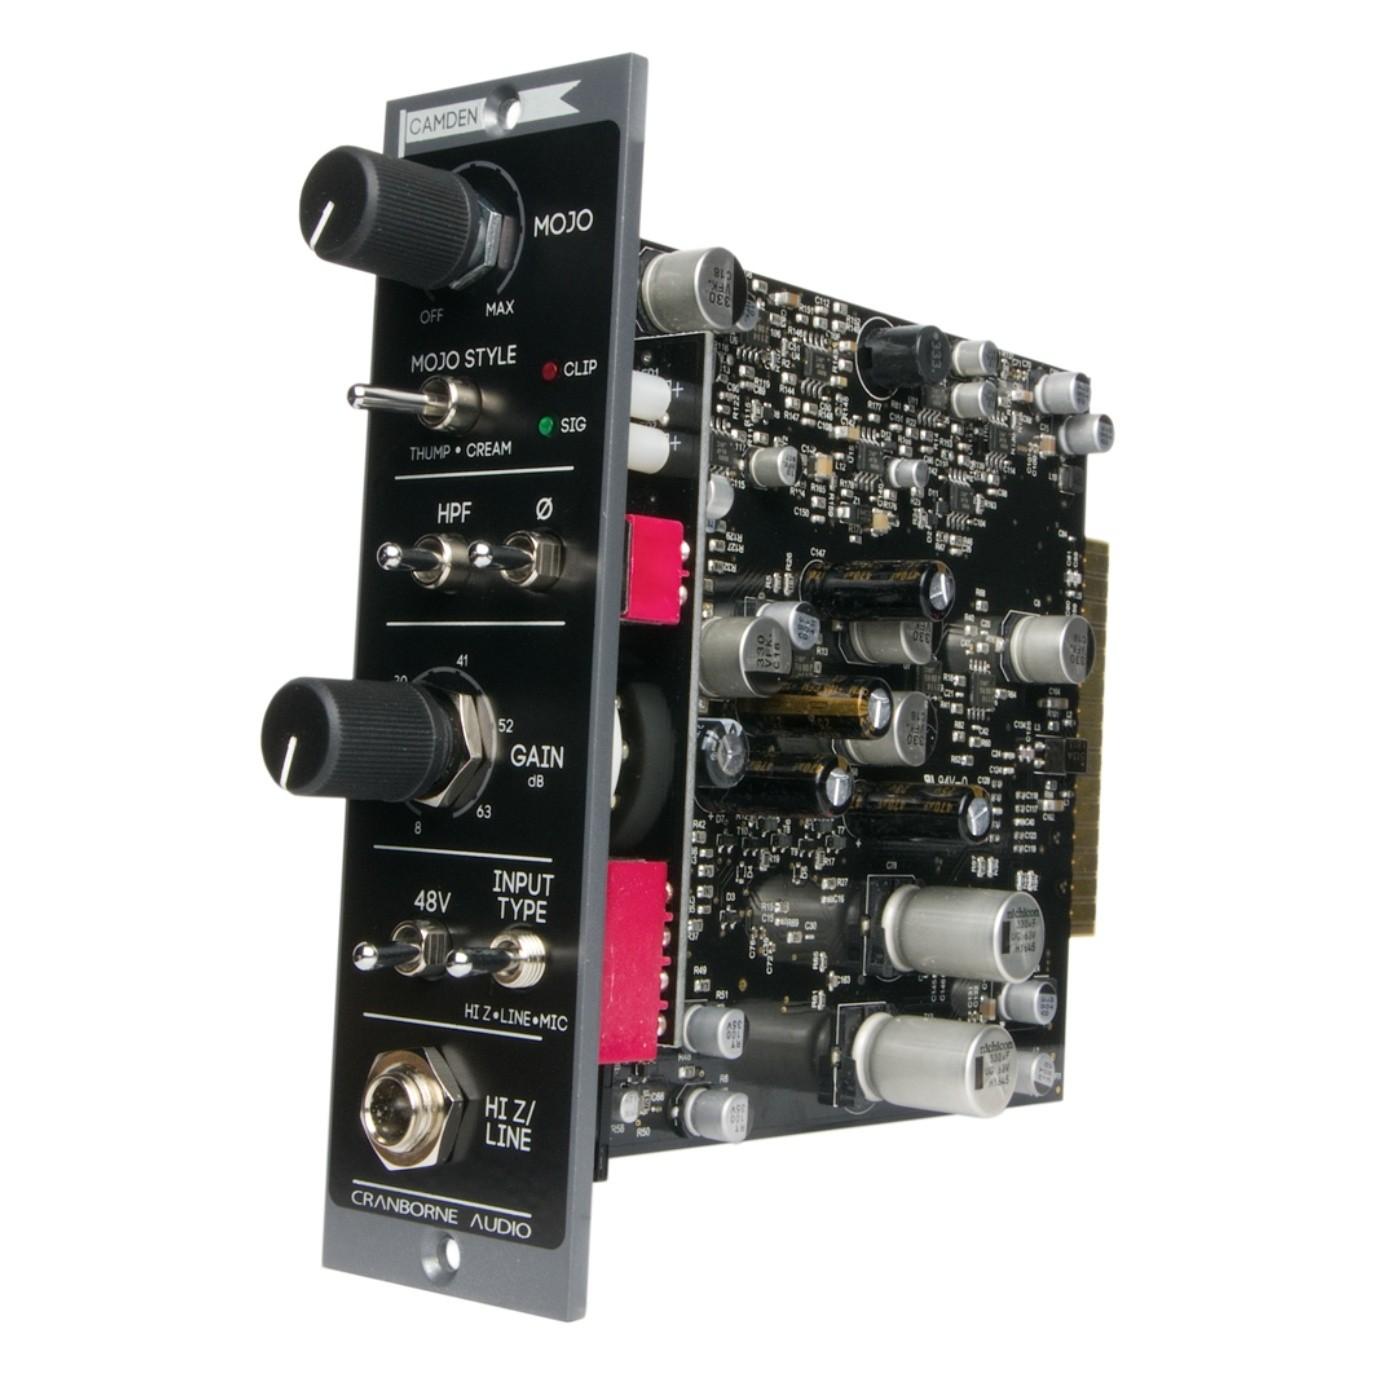 Cranborne Audio Camden 500 Preamp And Signal Processor Giraffe Circuits Microphone Amplifier New